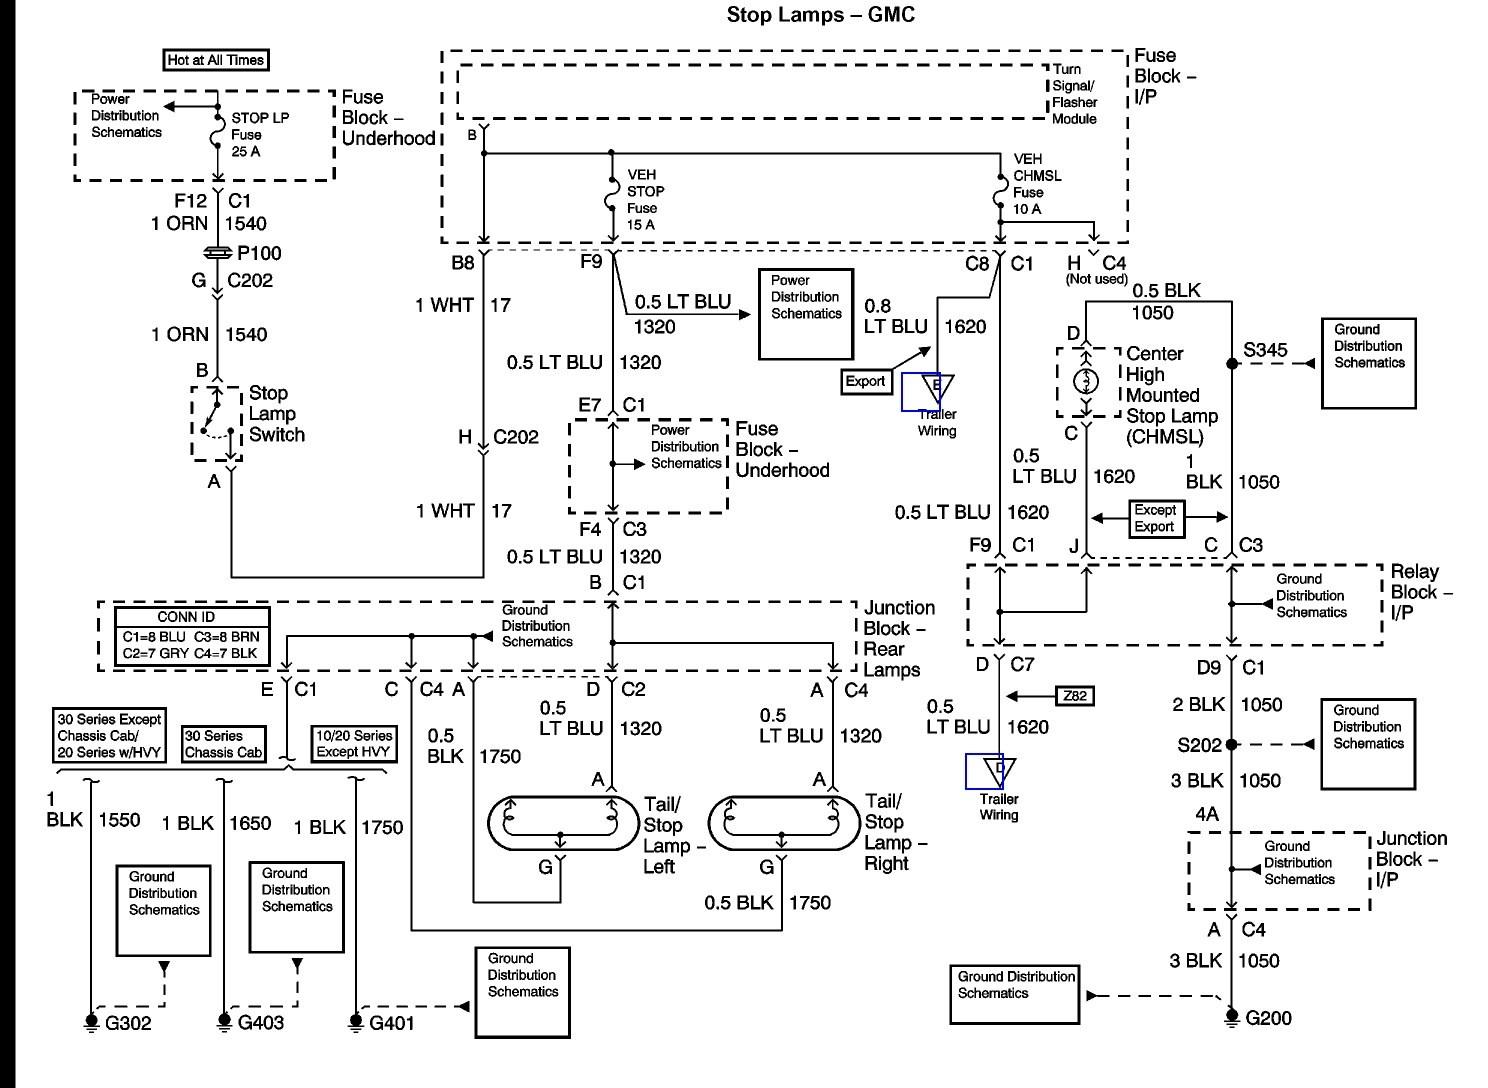 F350 Wiring Diagram For Rear Tail Lights Elegant